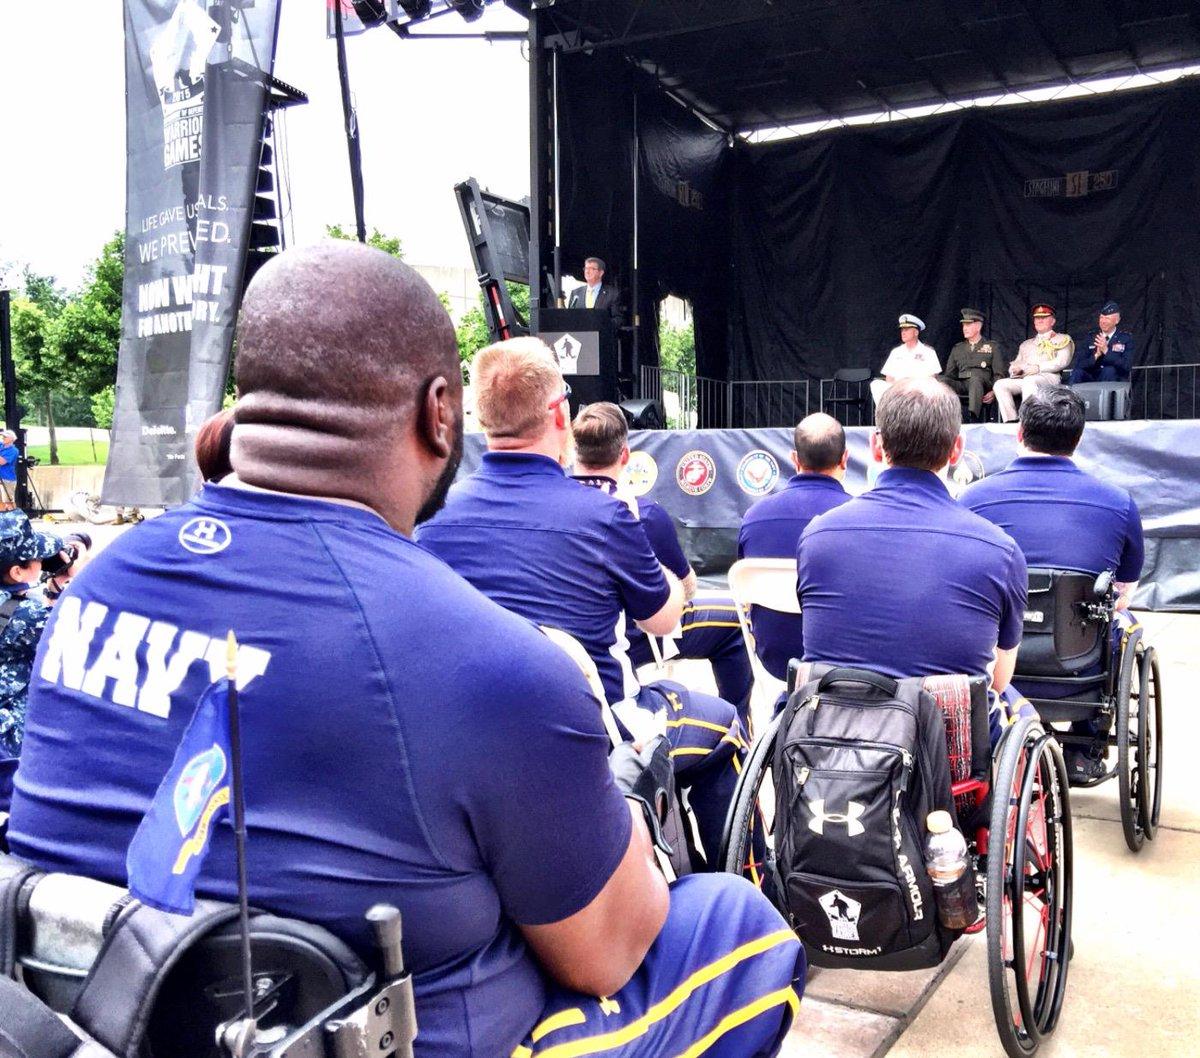 #SecDef Ashton Carter welcomes athletes #WarriorGames #TeamNavy @navysafeharbor http://t.co/LrJgUOywJH